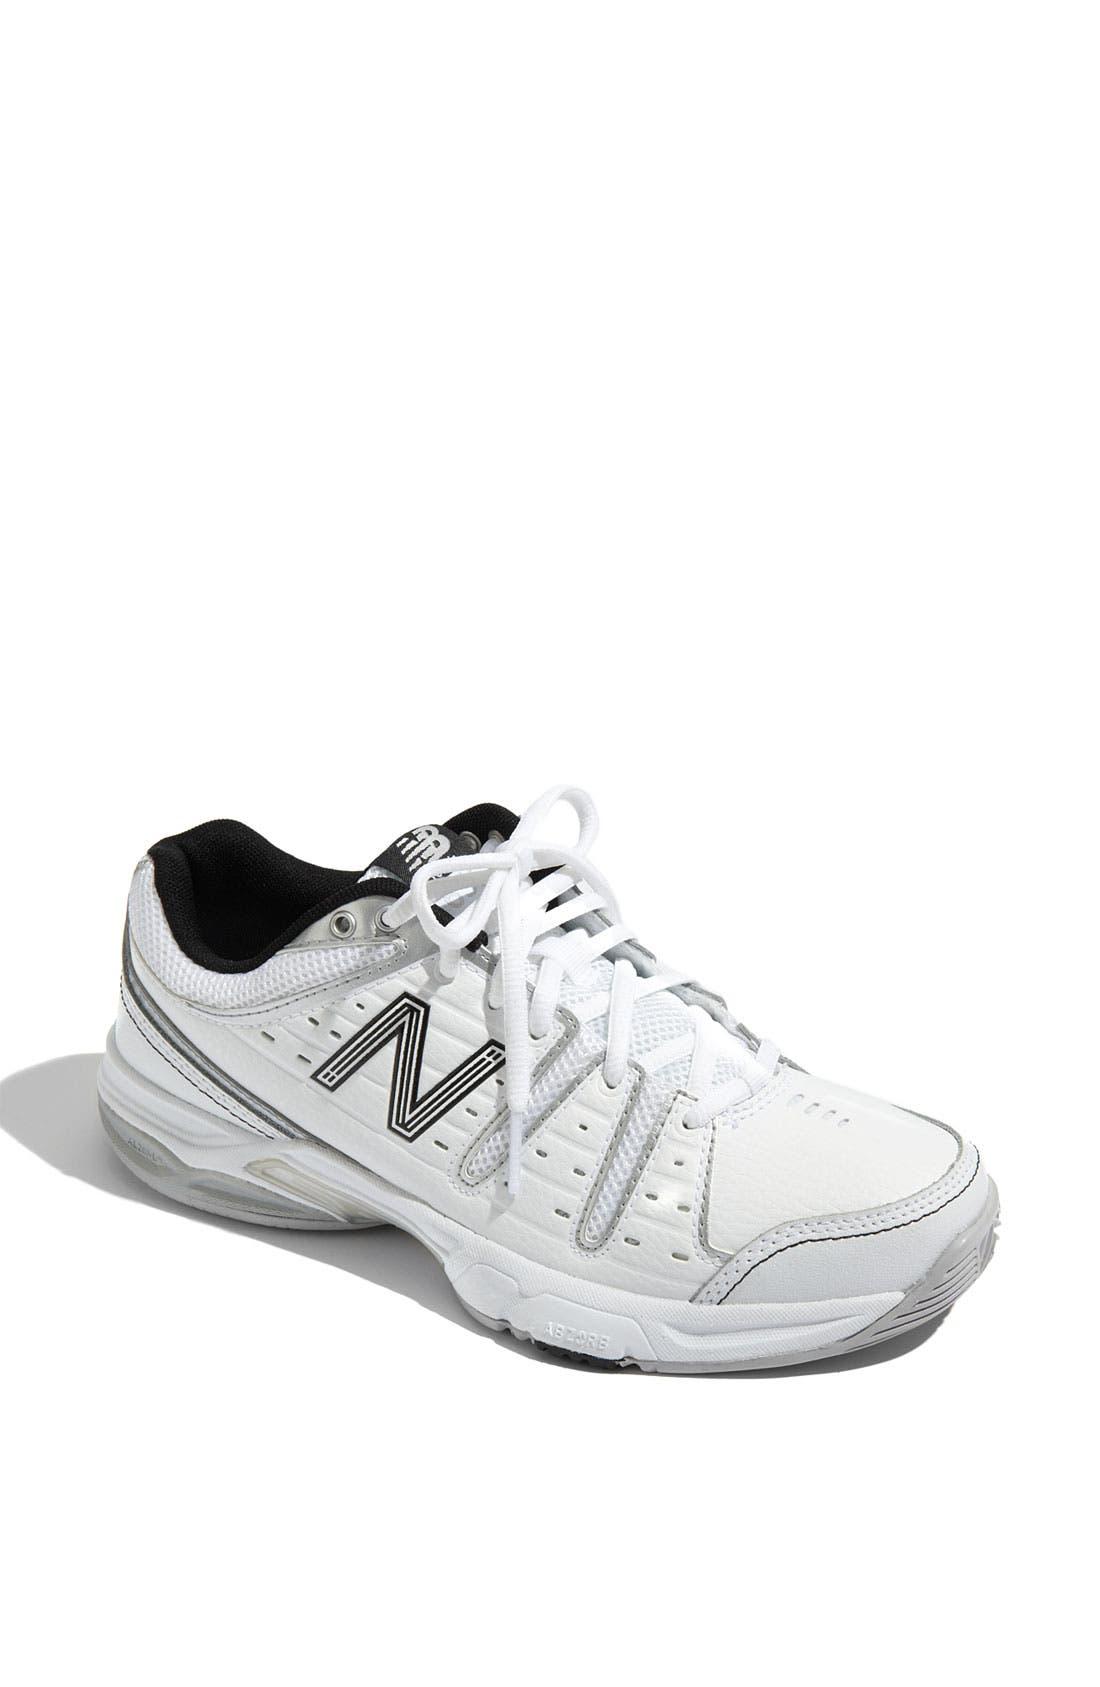 Main Image - New Balance '656' Tennis Shoe (Women)(Retail Price: $79.95)